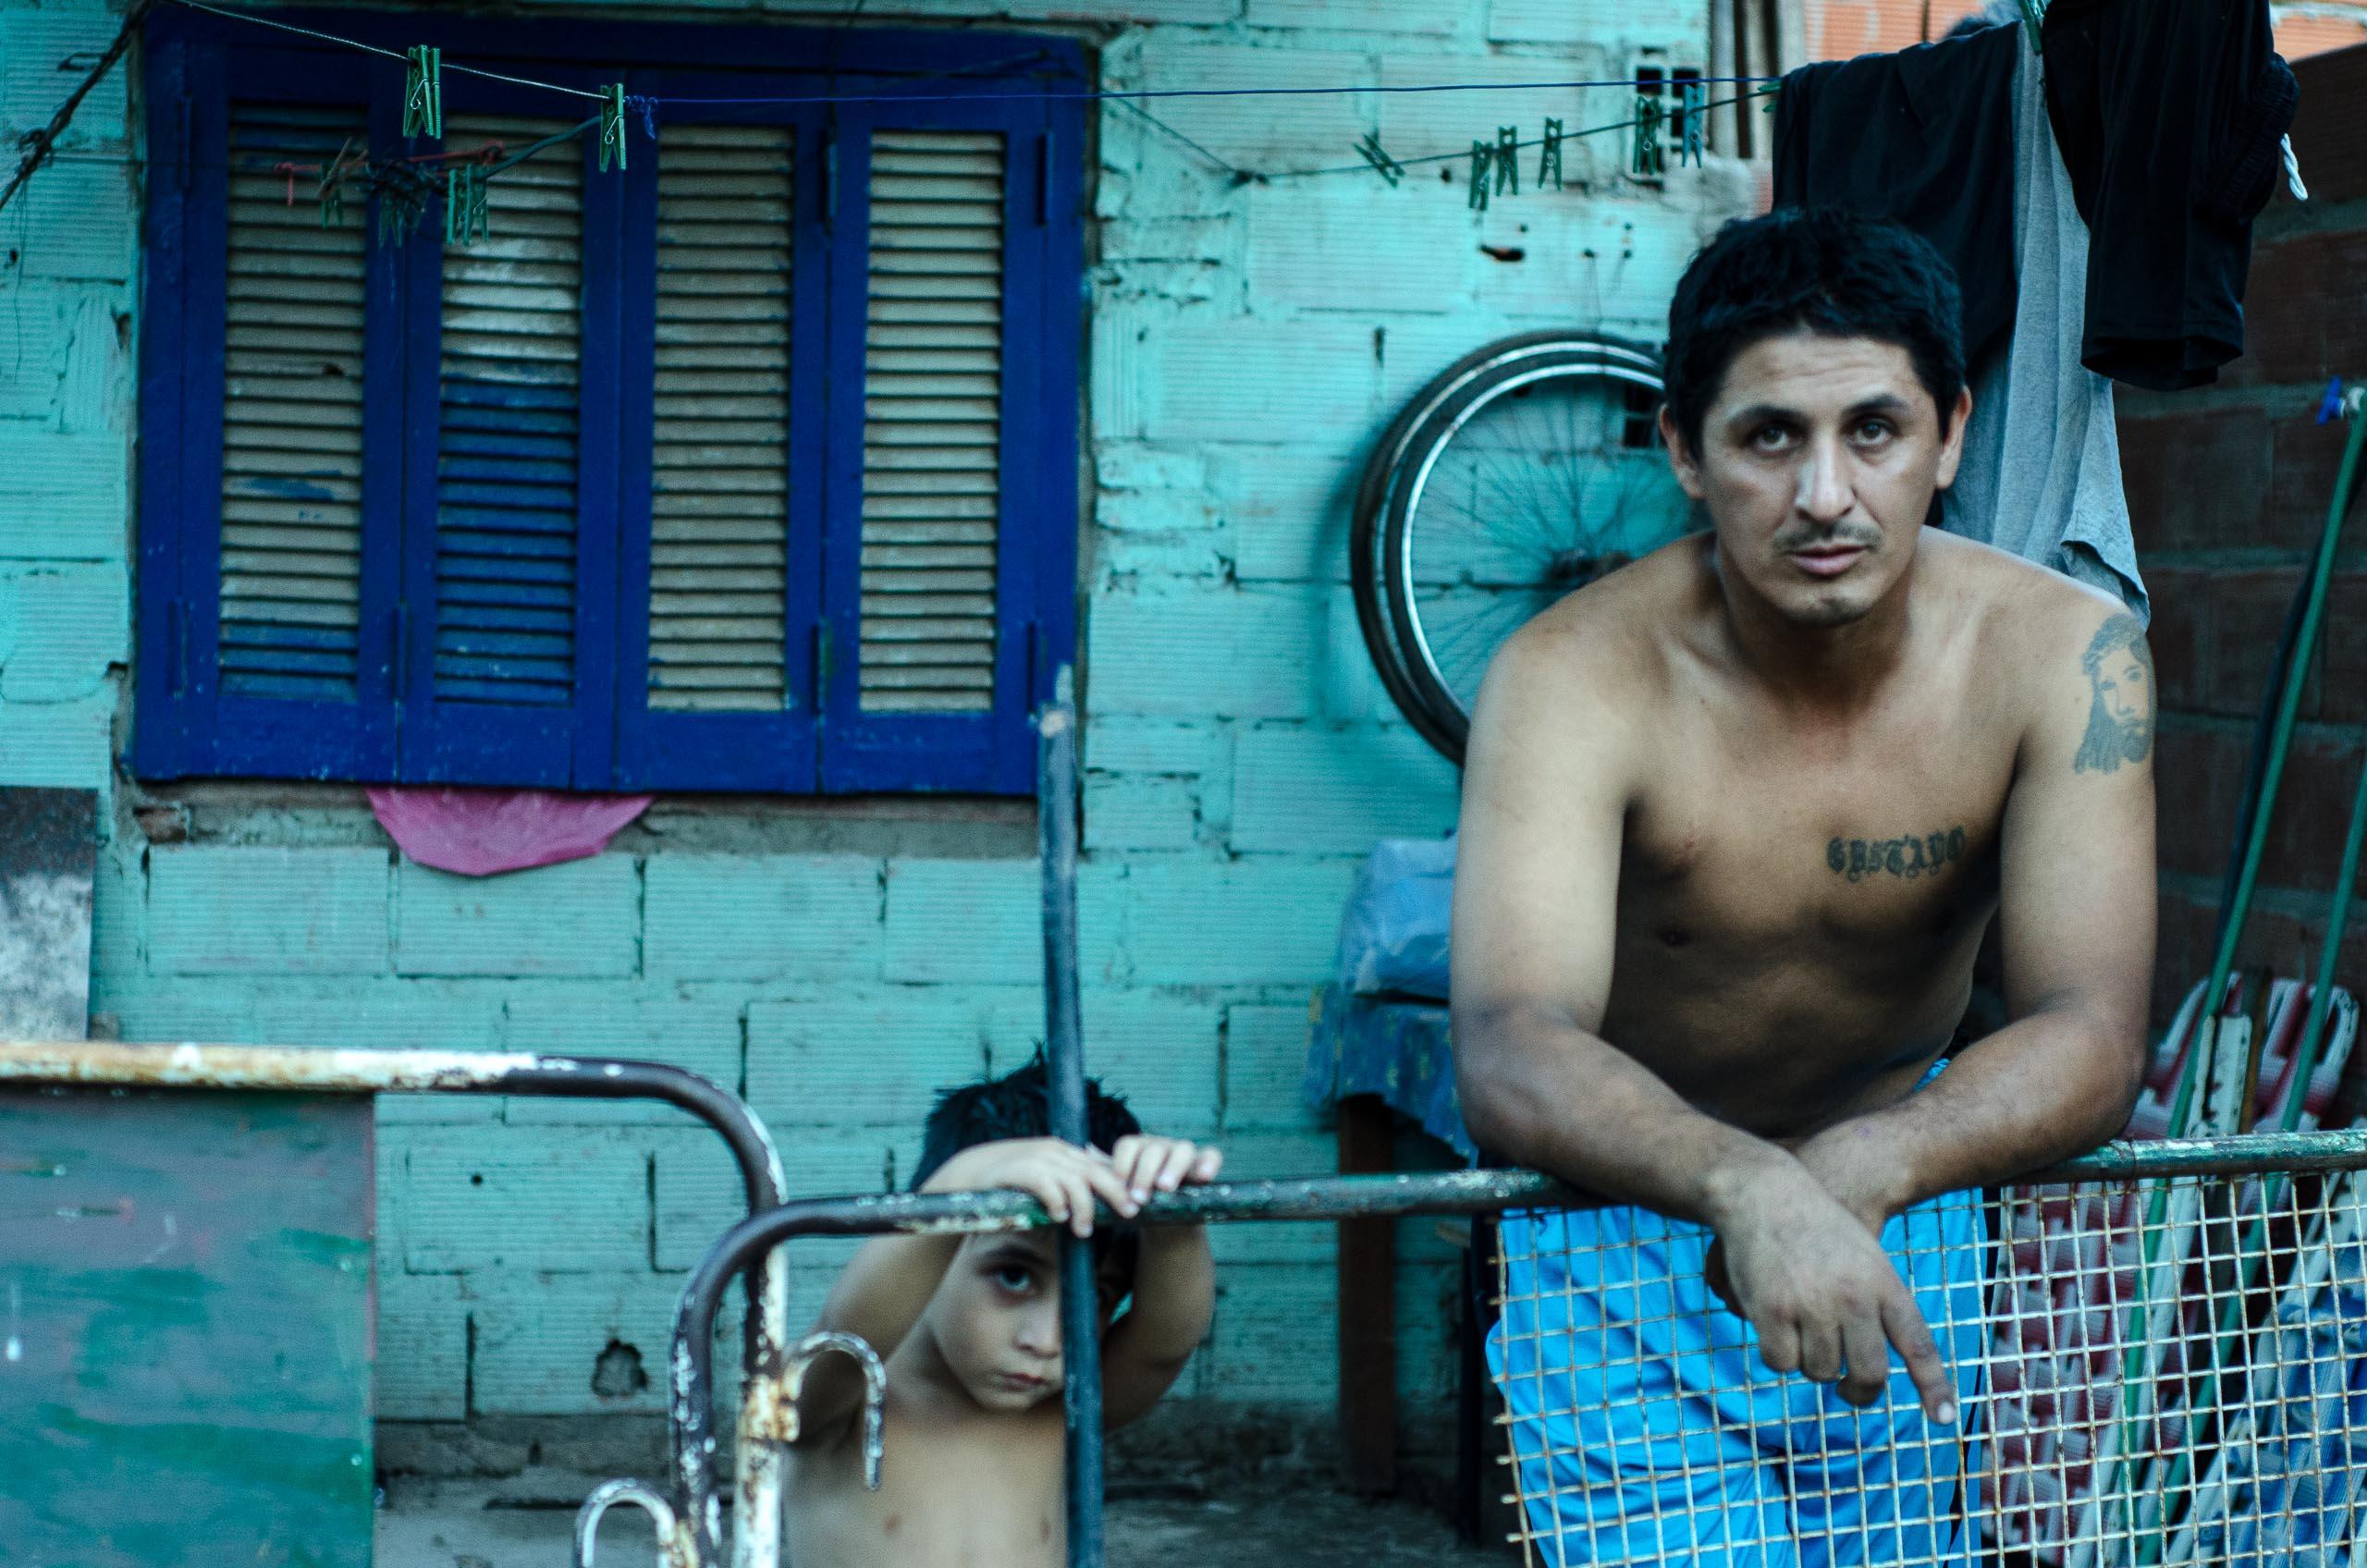 Triple Crimen, de Rubén Plataneo | Foto: filmstofestivals